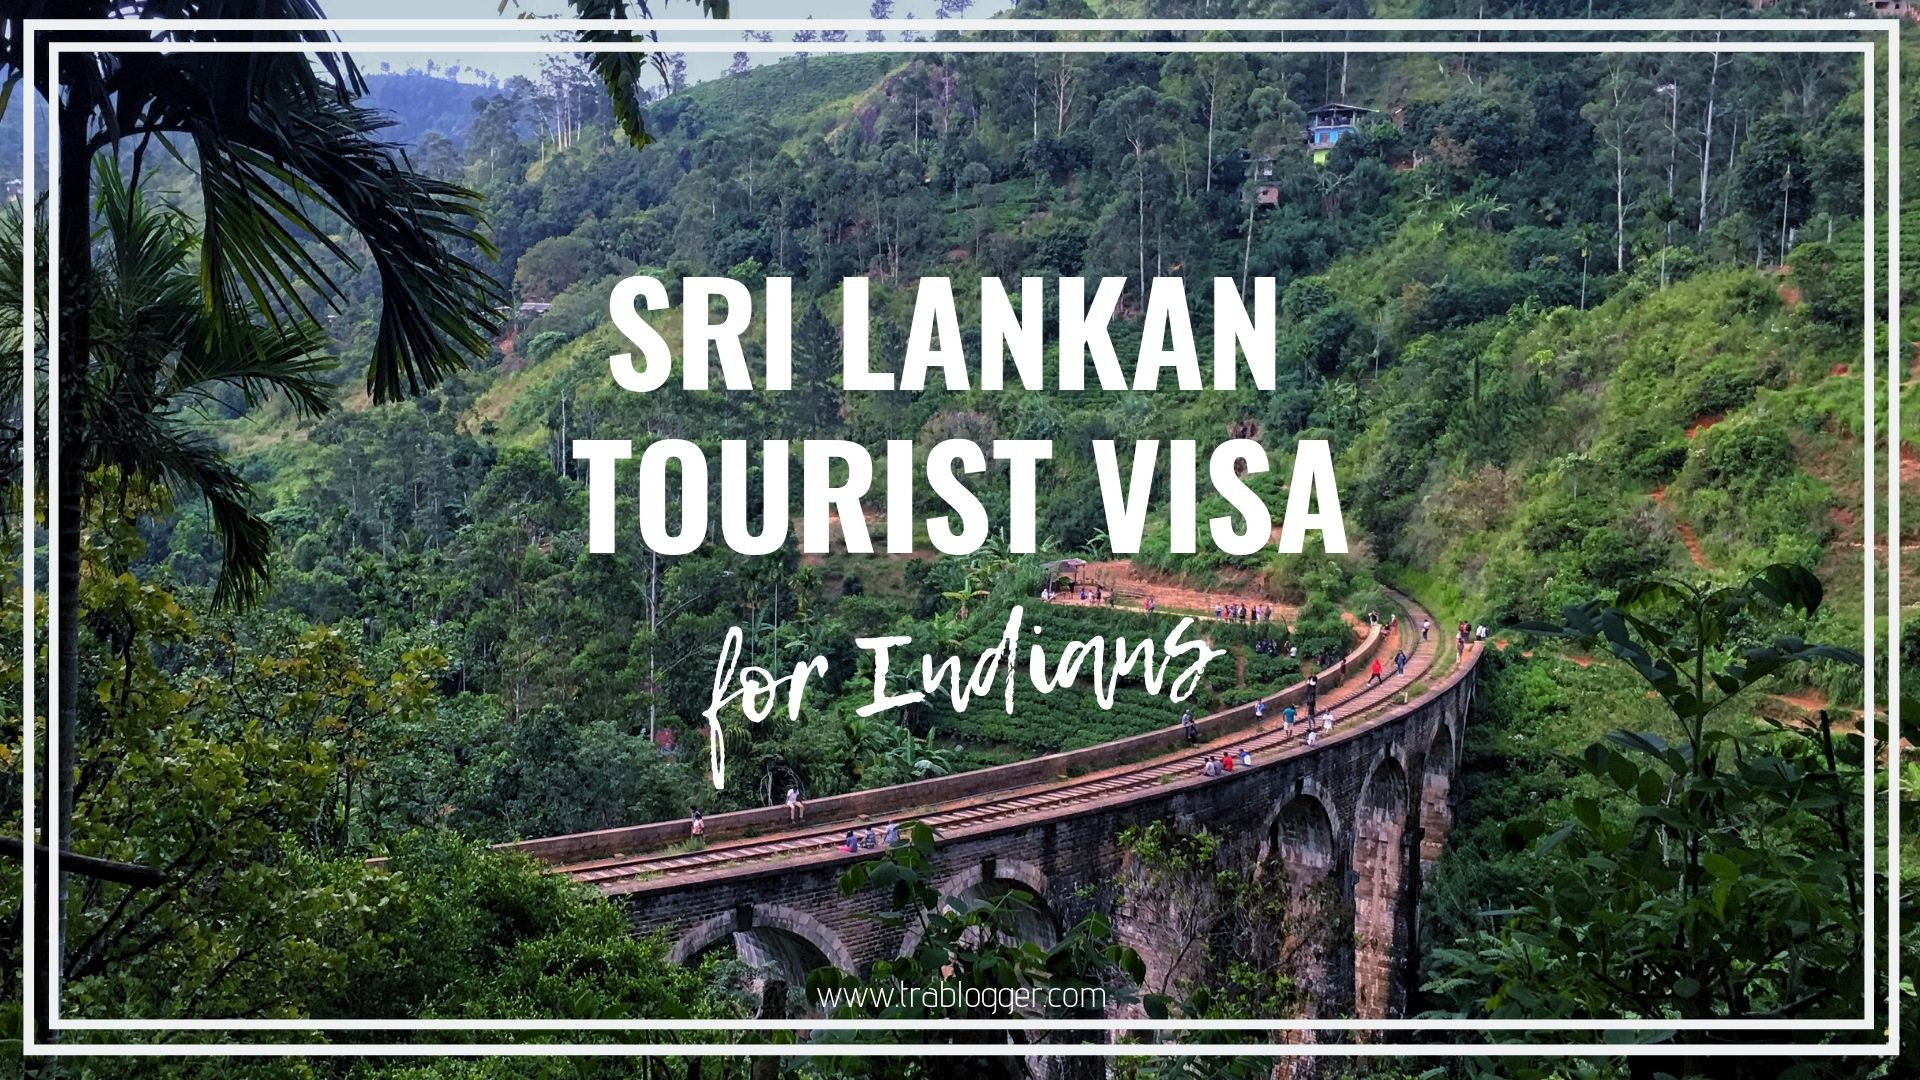 Sri Lankan Tourist Visa for Indians